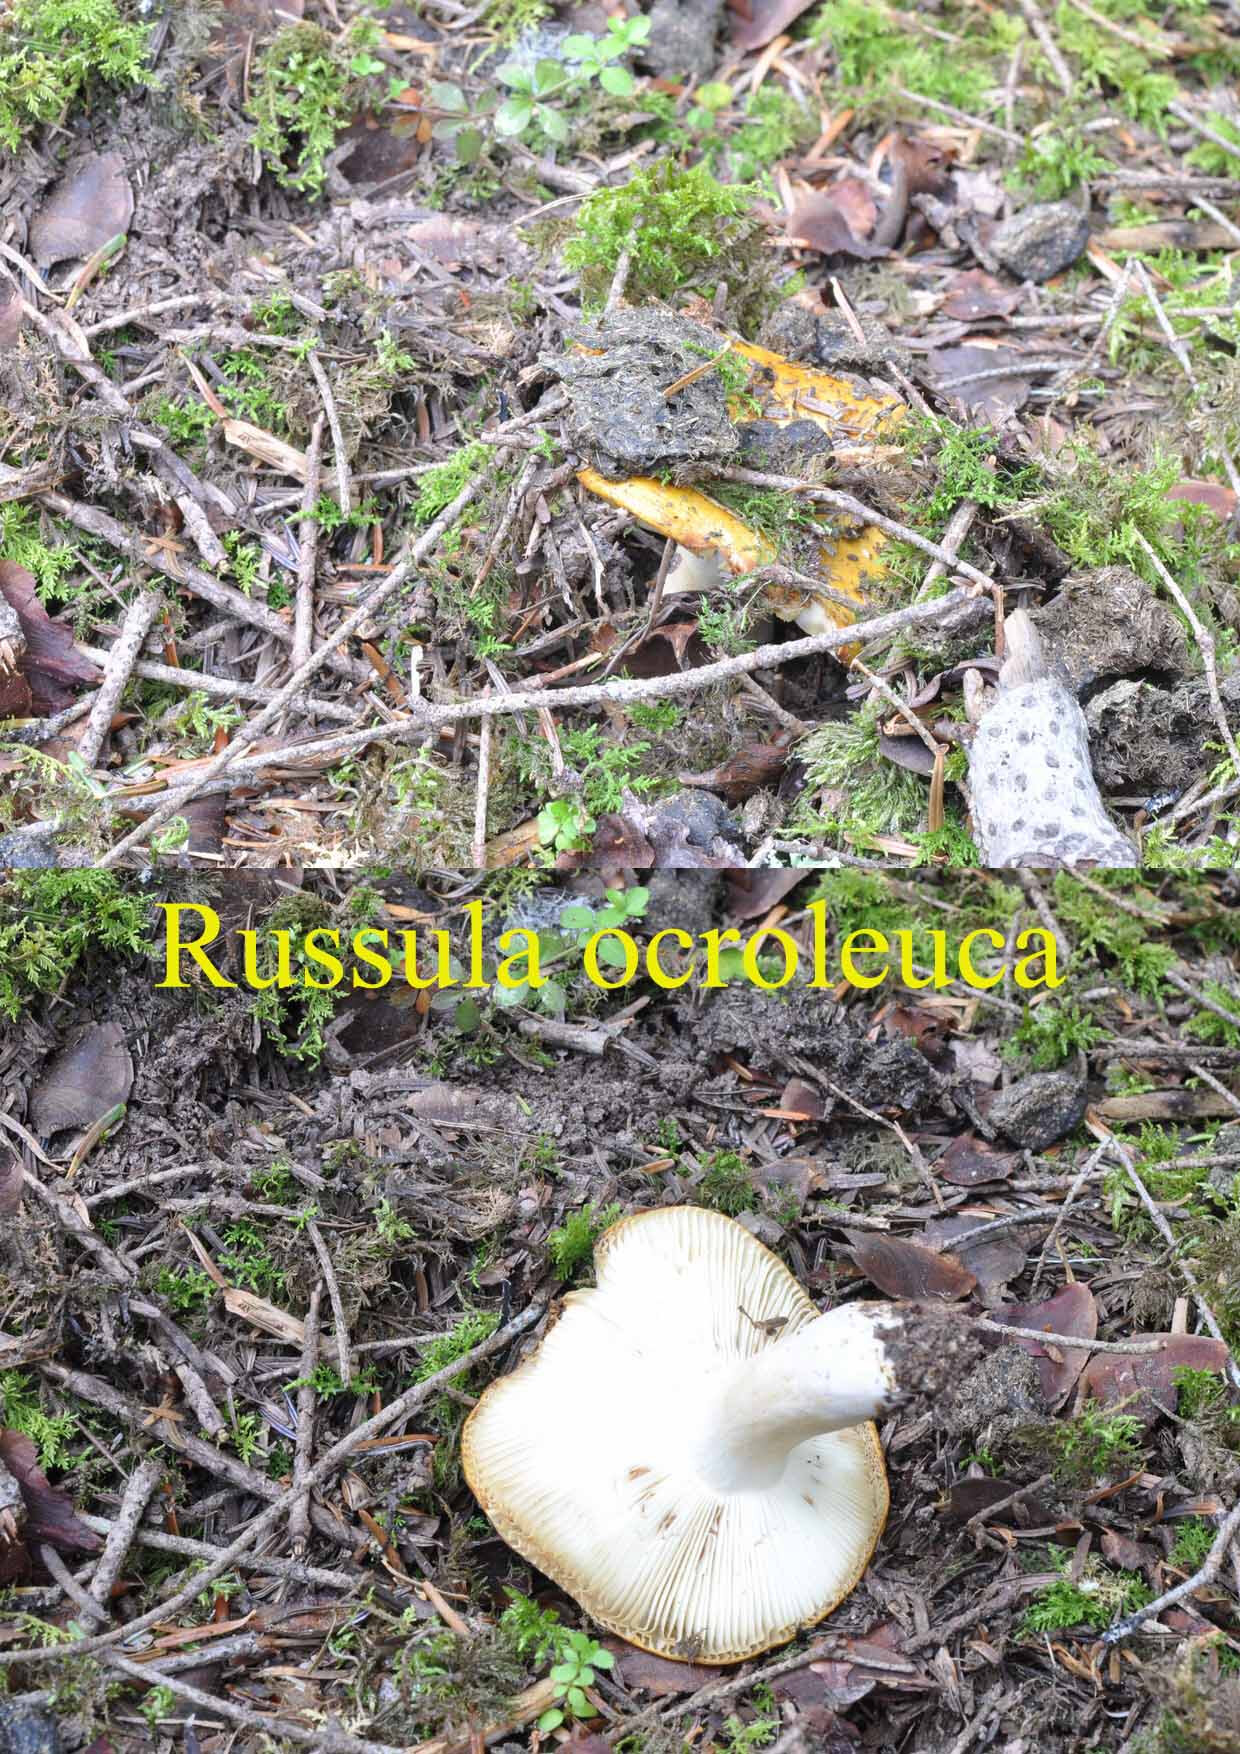 Russula ocroleuca